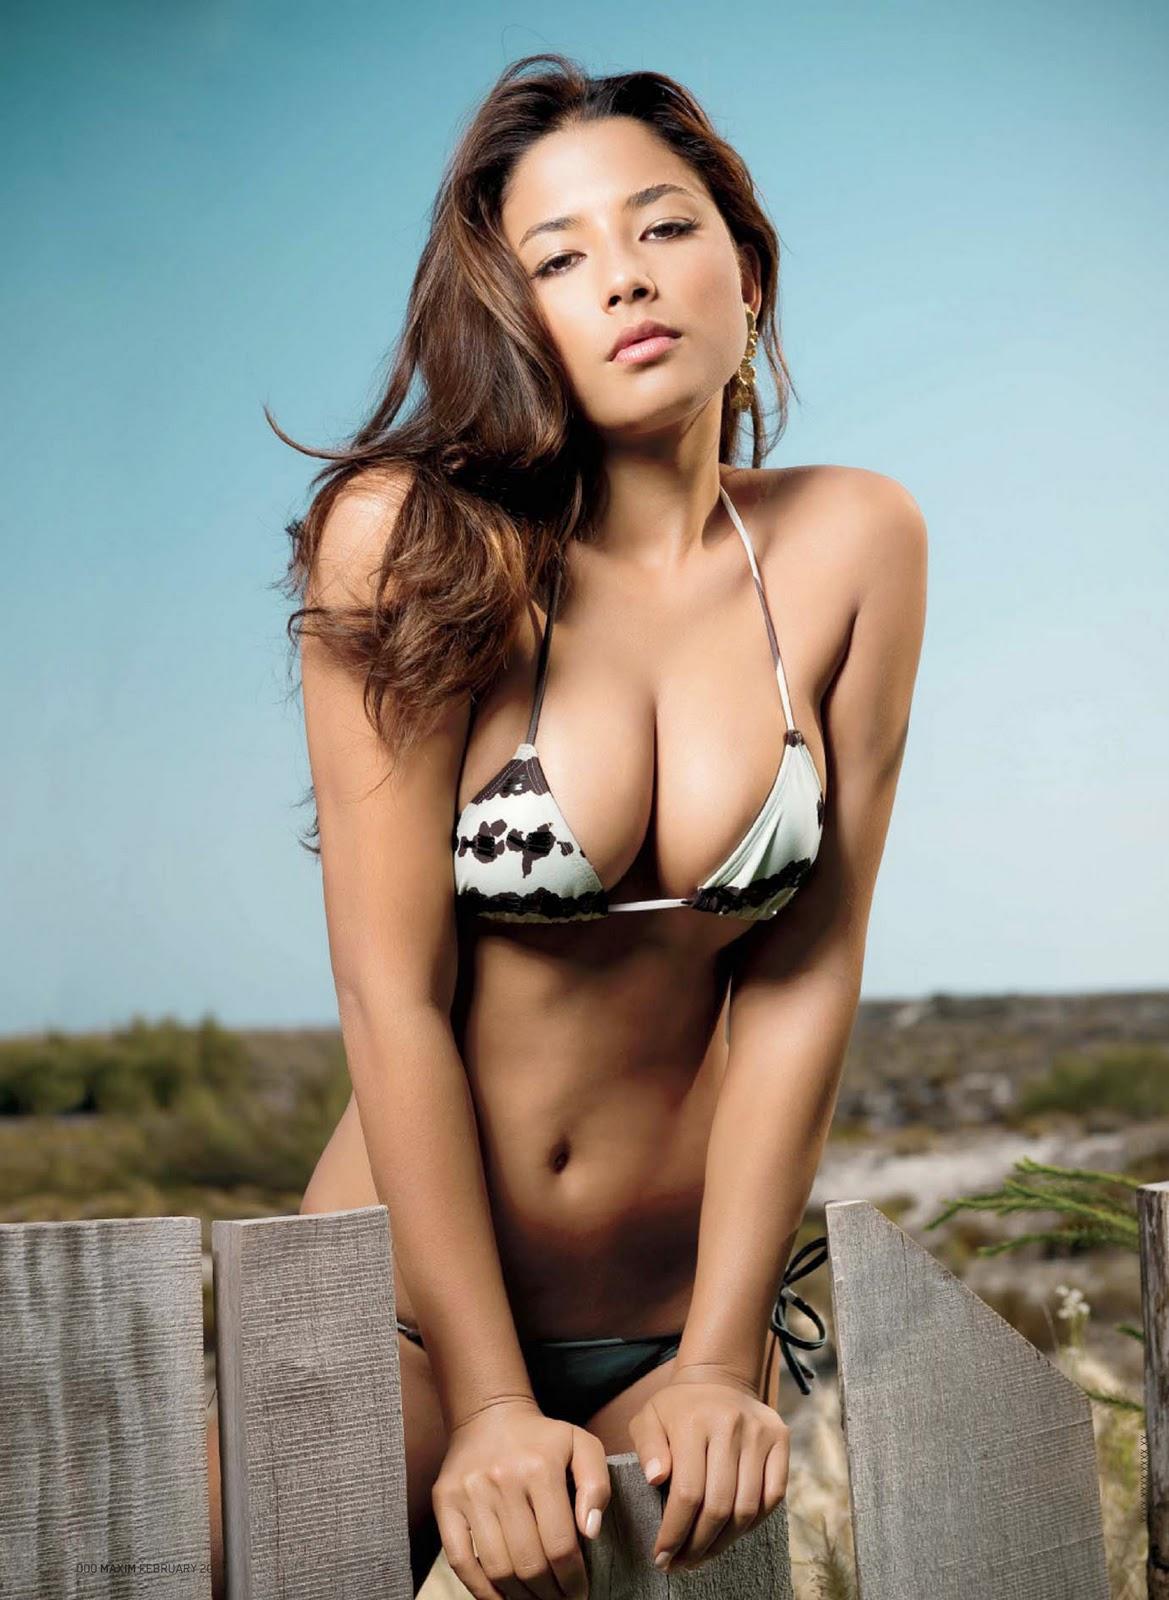 Singaporean Sexy Girl: Jessica Gomes - Singapore sexy model